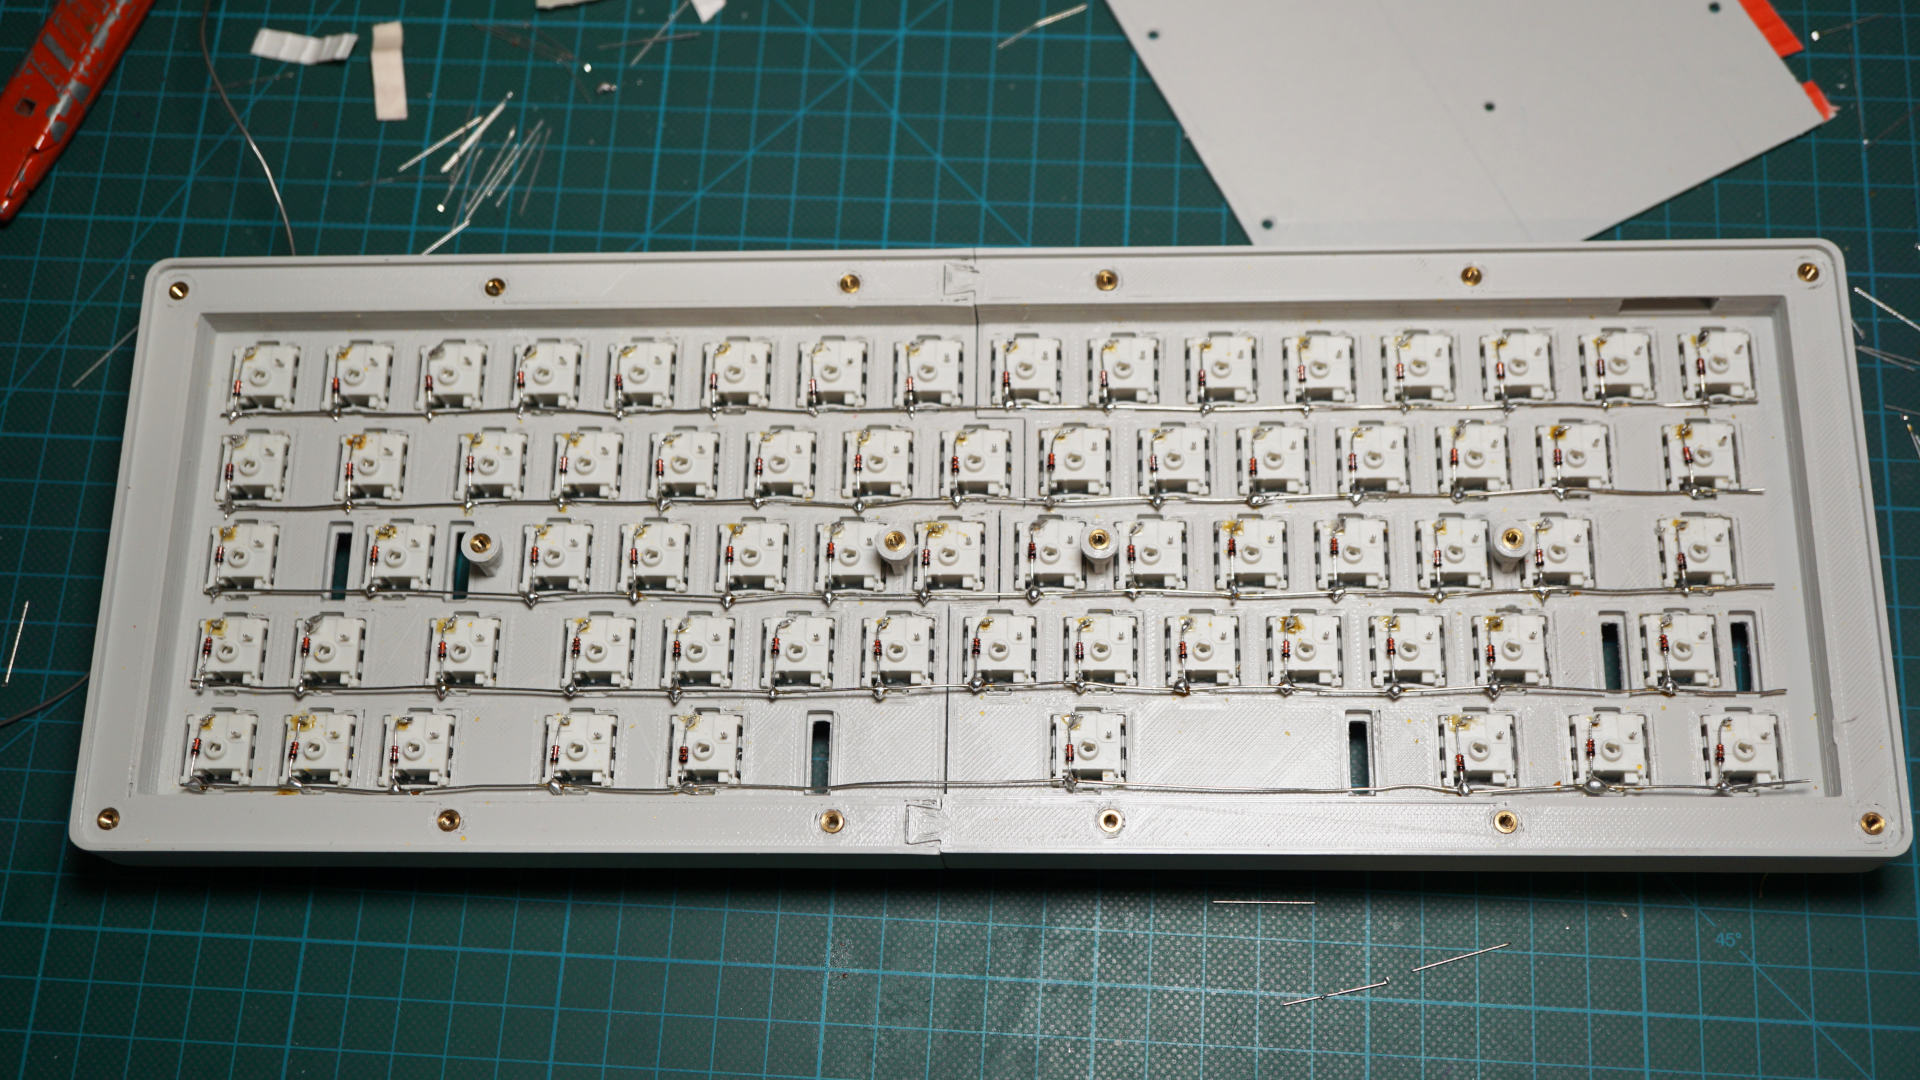 Hand-wiring a custom keyboard on